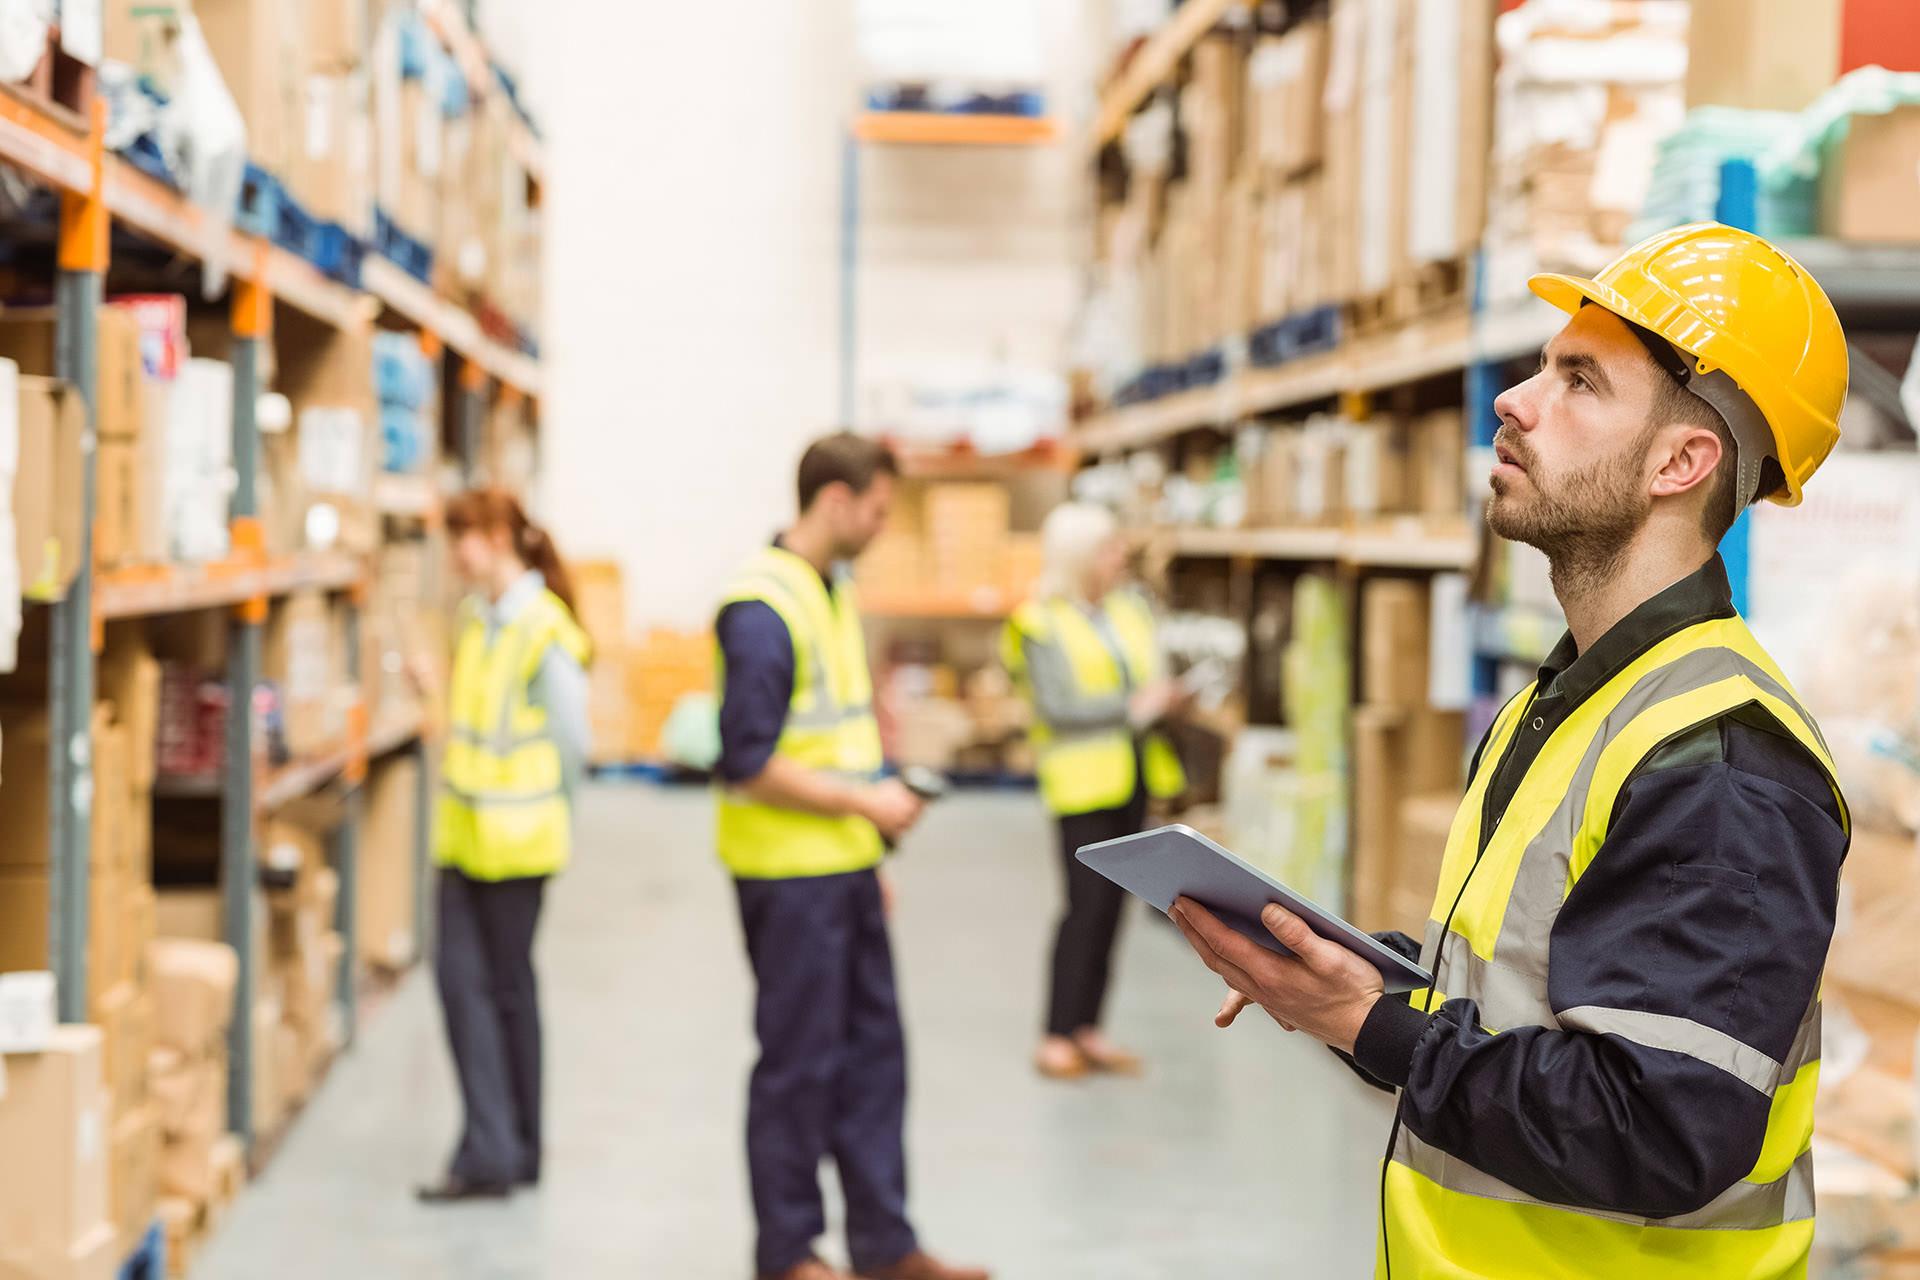 northern employment services industrial jobs